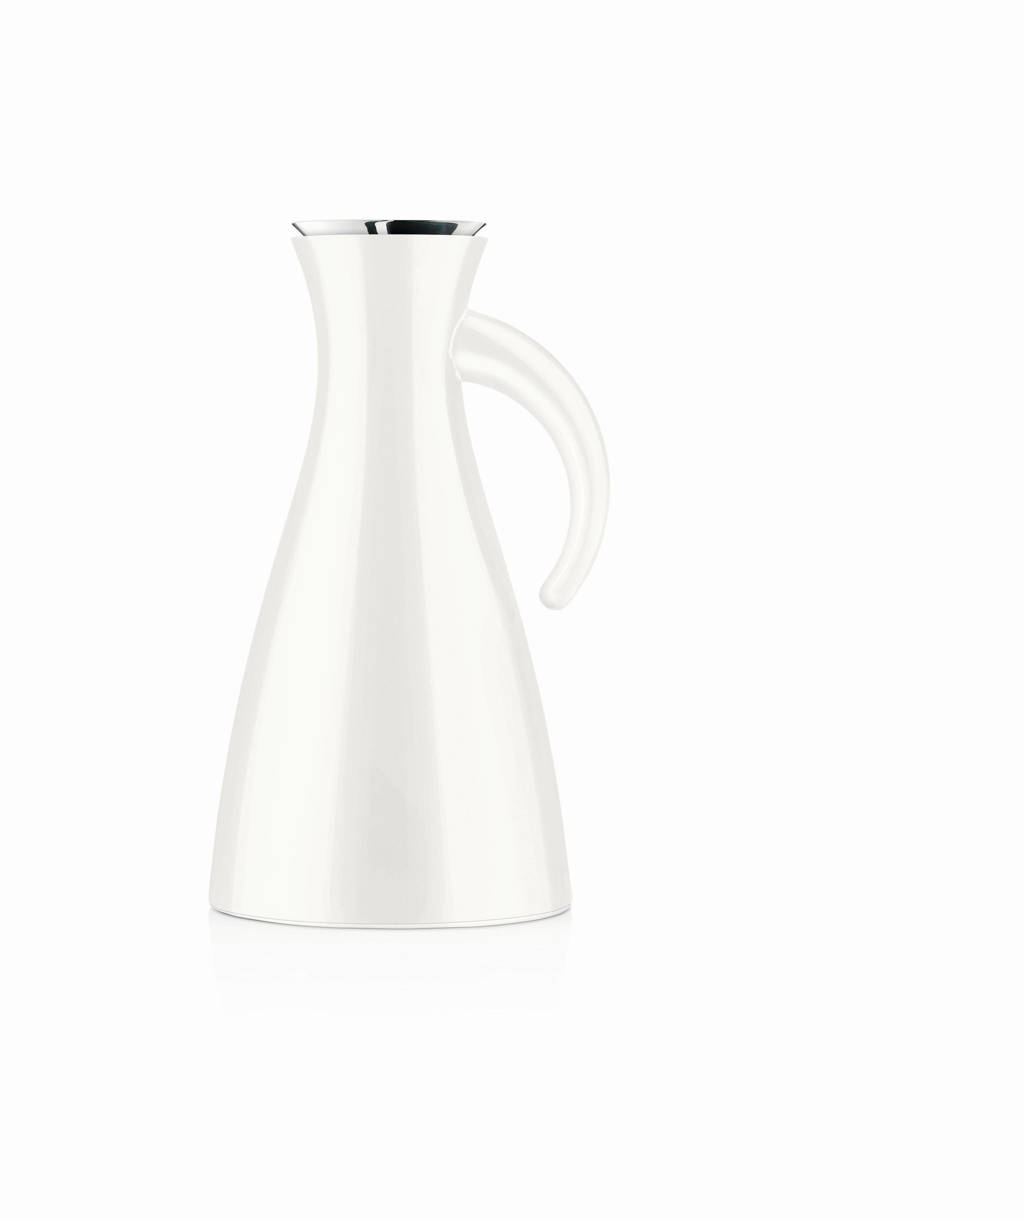 Eva Solo Thermoskan Vacuum Smal 1 liter, Wit